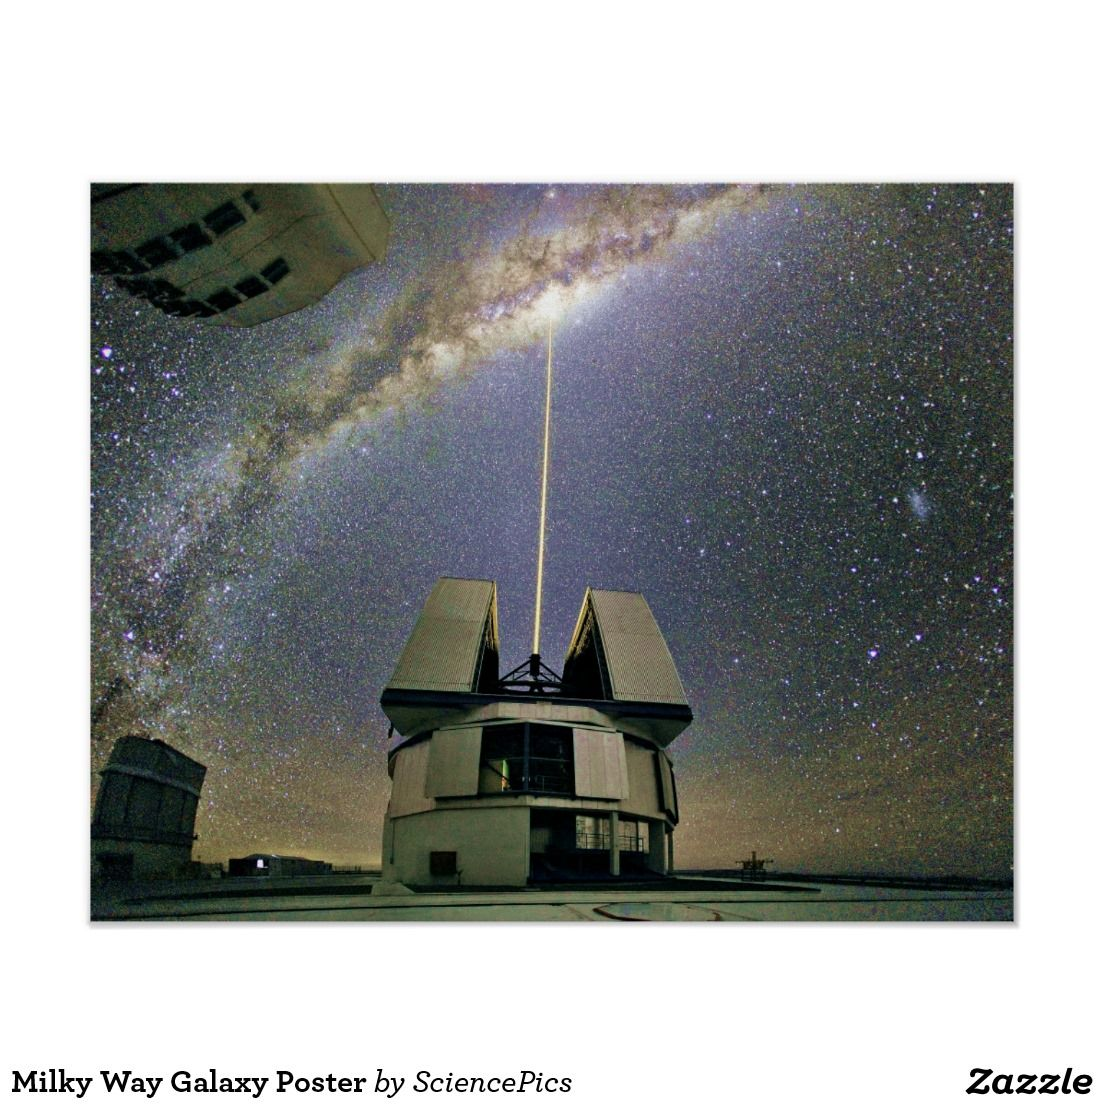 Milky Way Galaxy Poster